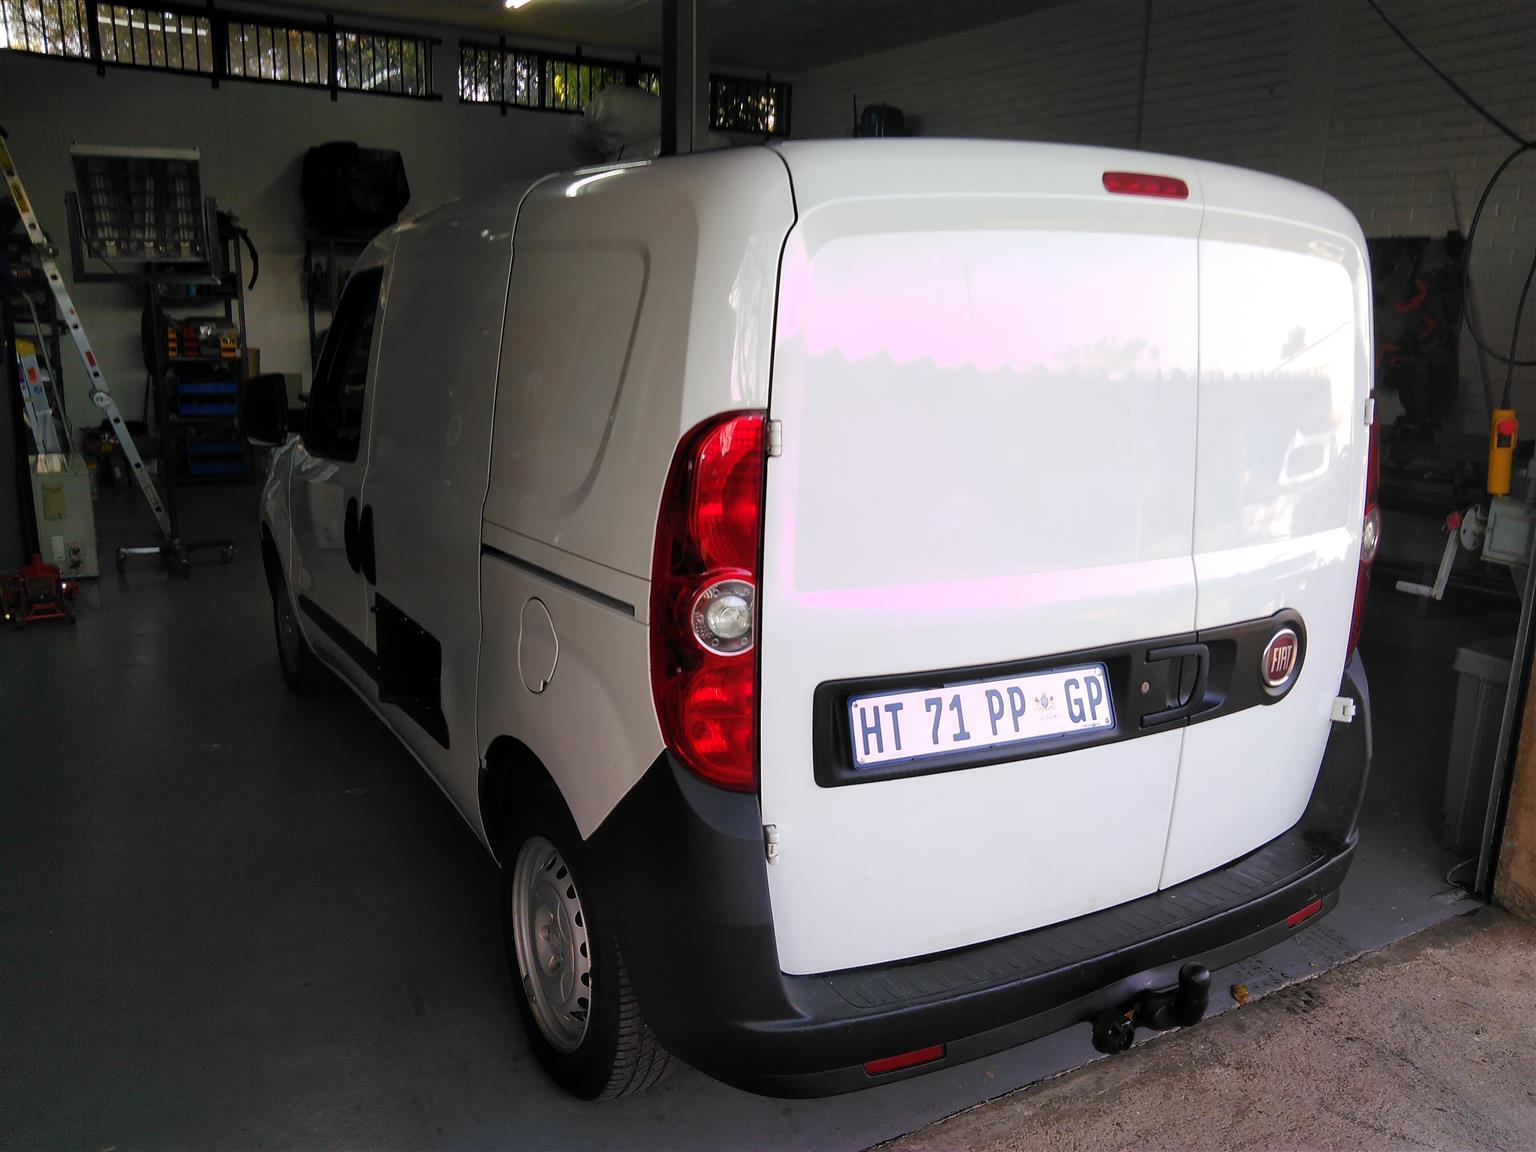 2015 Fiat Doblo Cargo 1.3 Multijet (aircon)